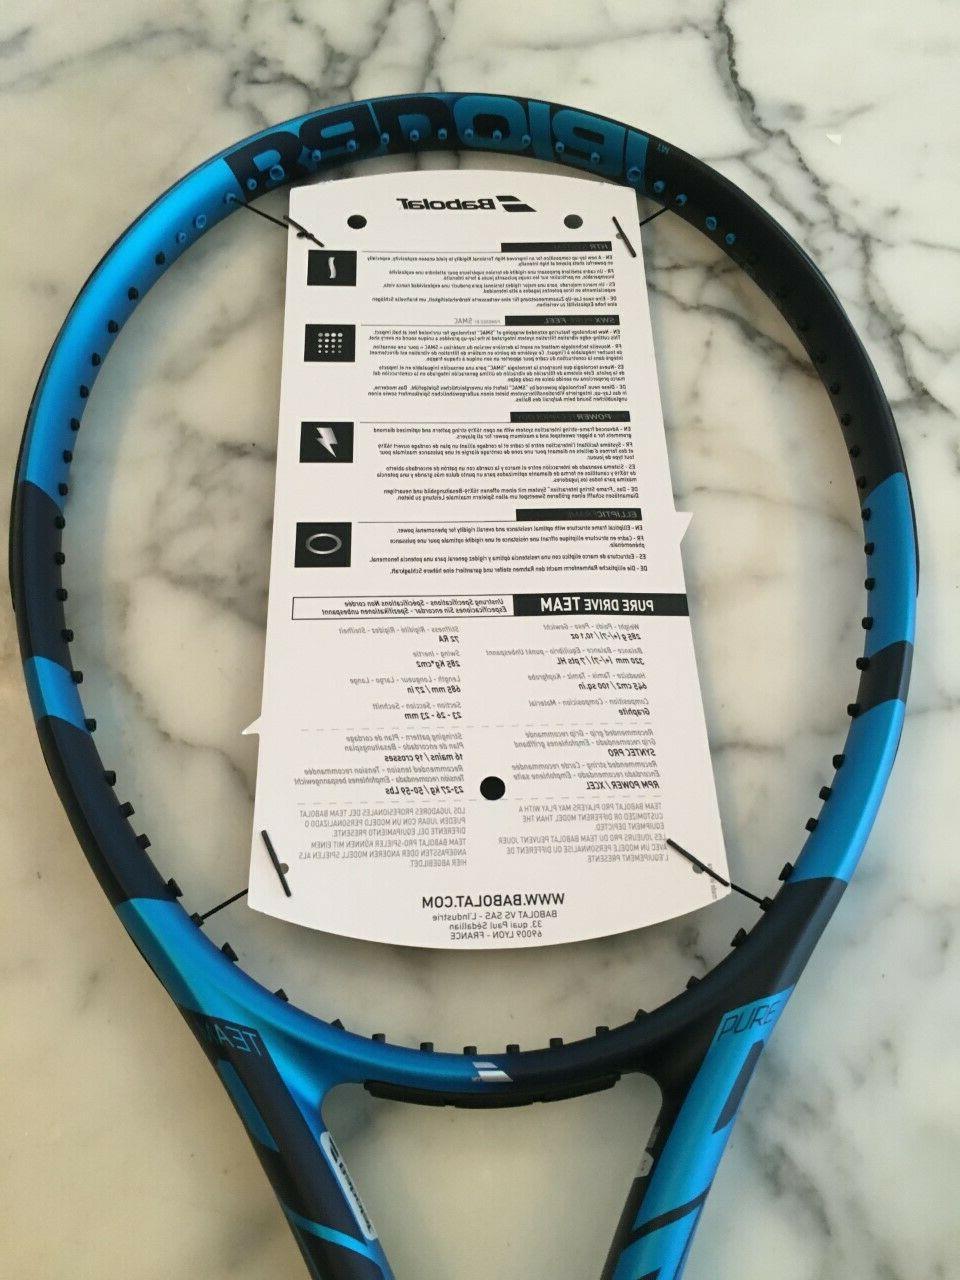 pure drive team 2021 latest edition tennis